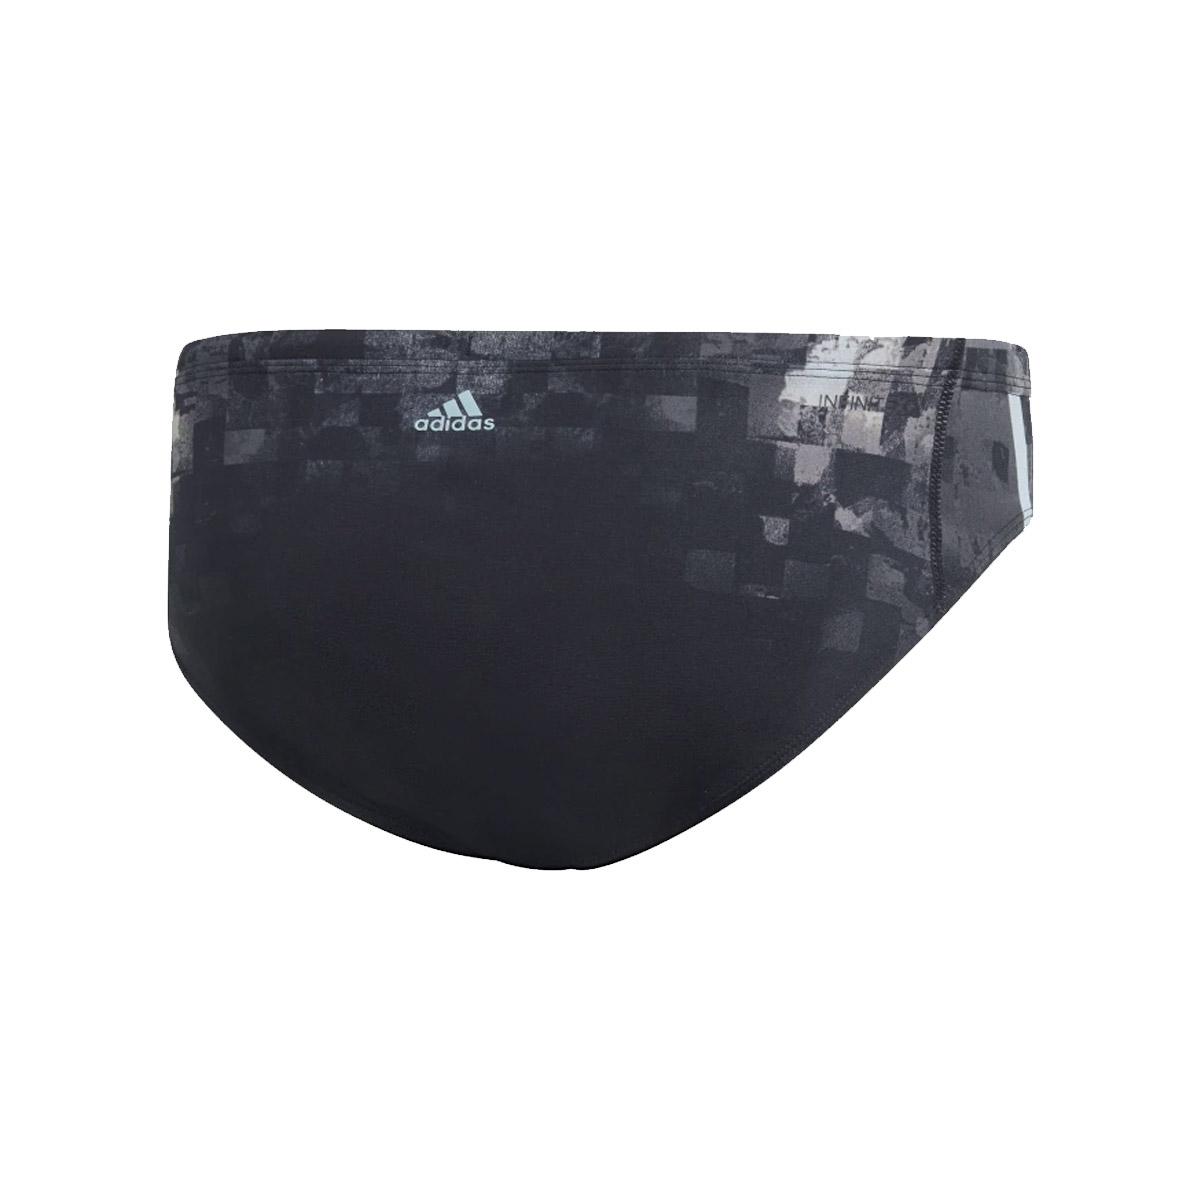 595b5187536bb0 Adidas Pro 3-stripes zwembroek van zwemslips